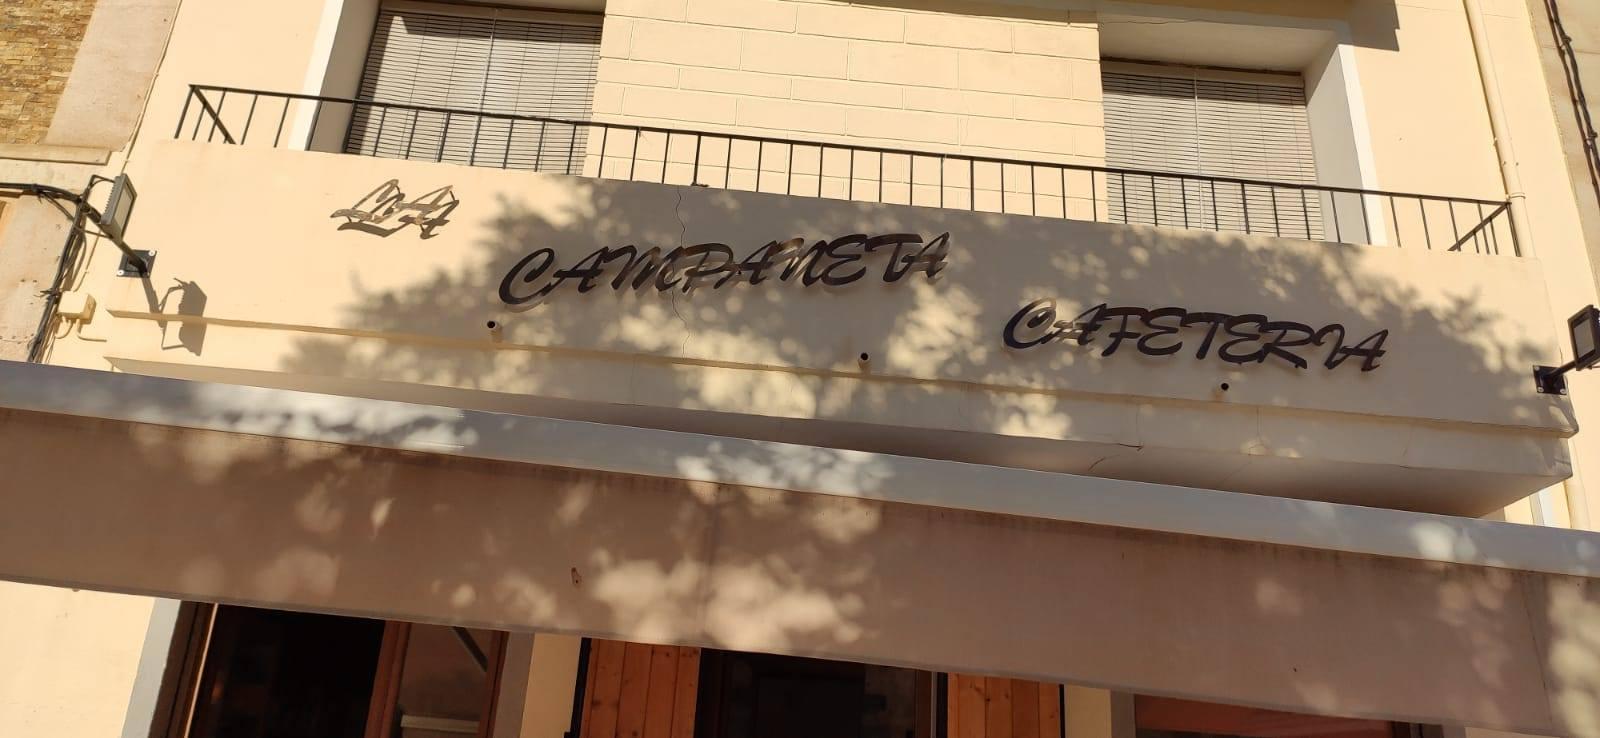 La Campaneta Cafeteria Logo